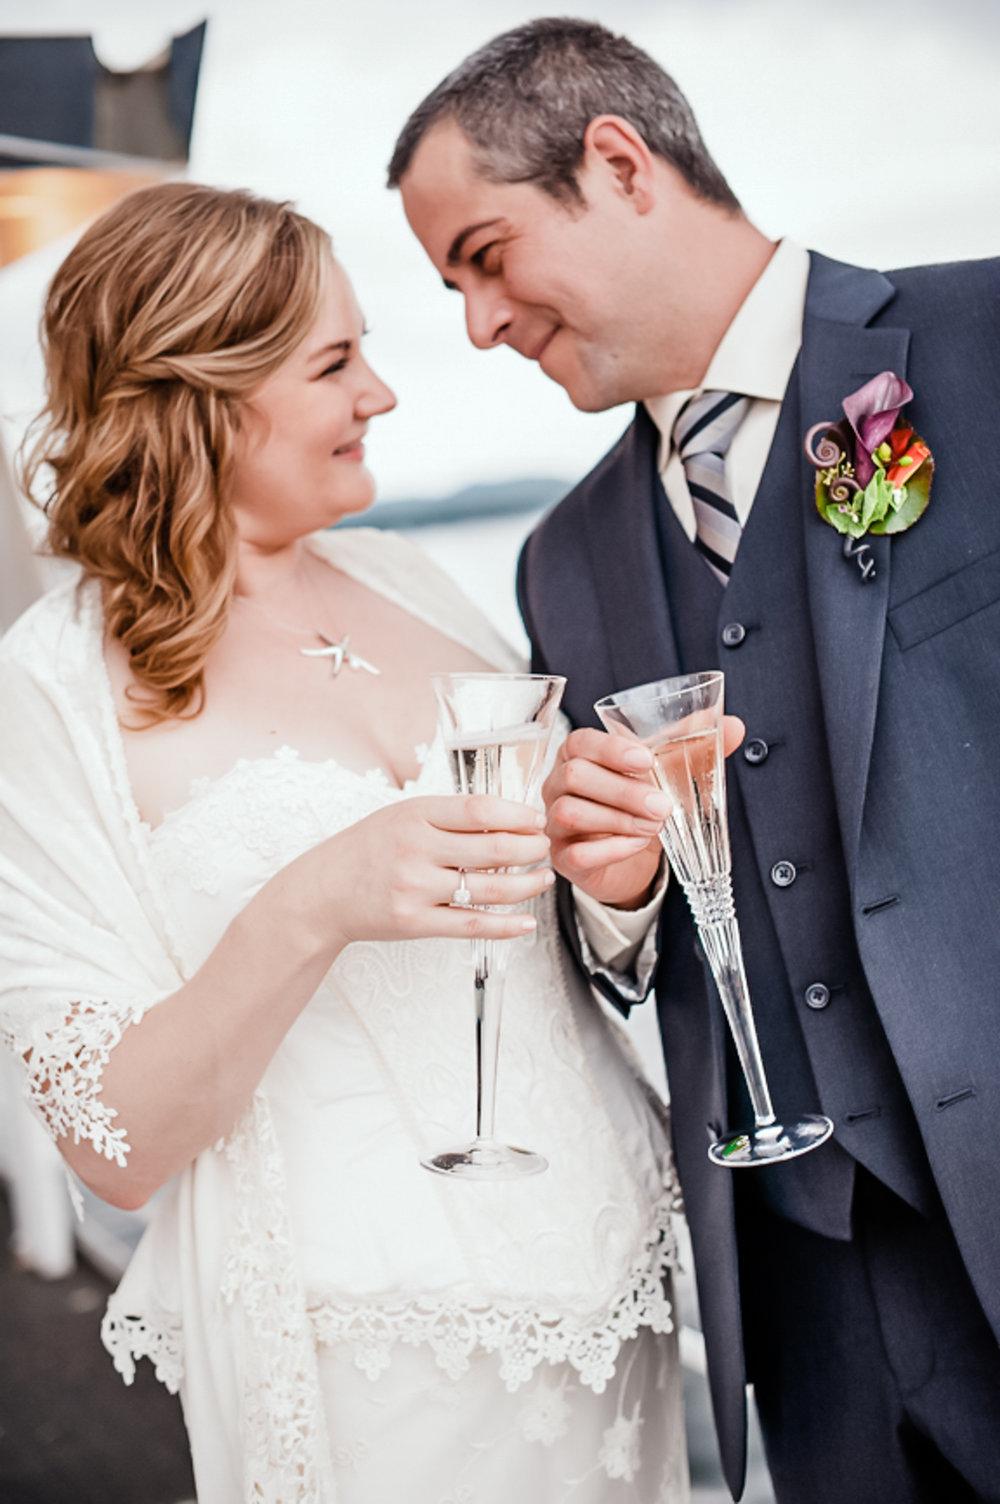 TerraSura-Weddings-Web-0567.jpg